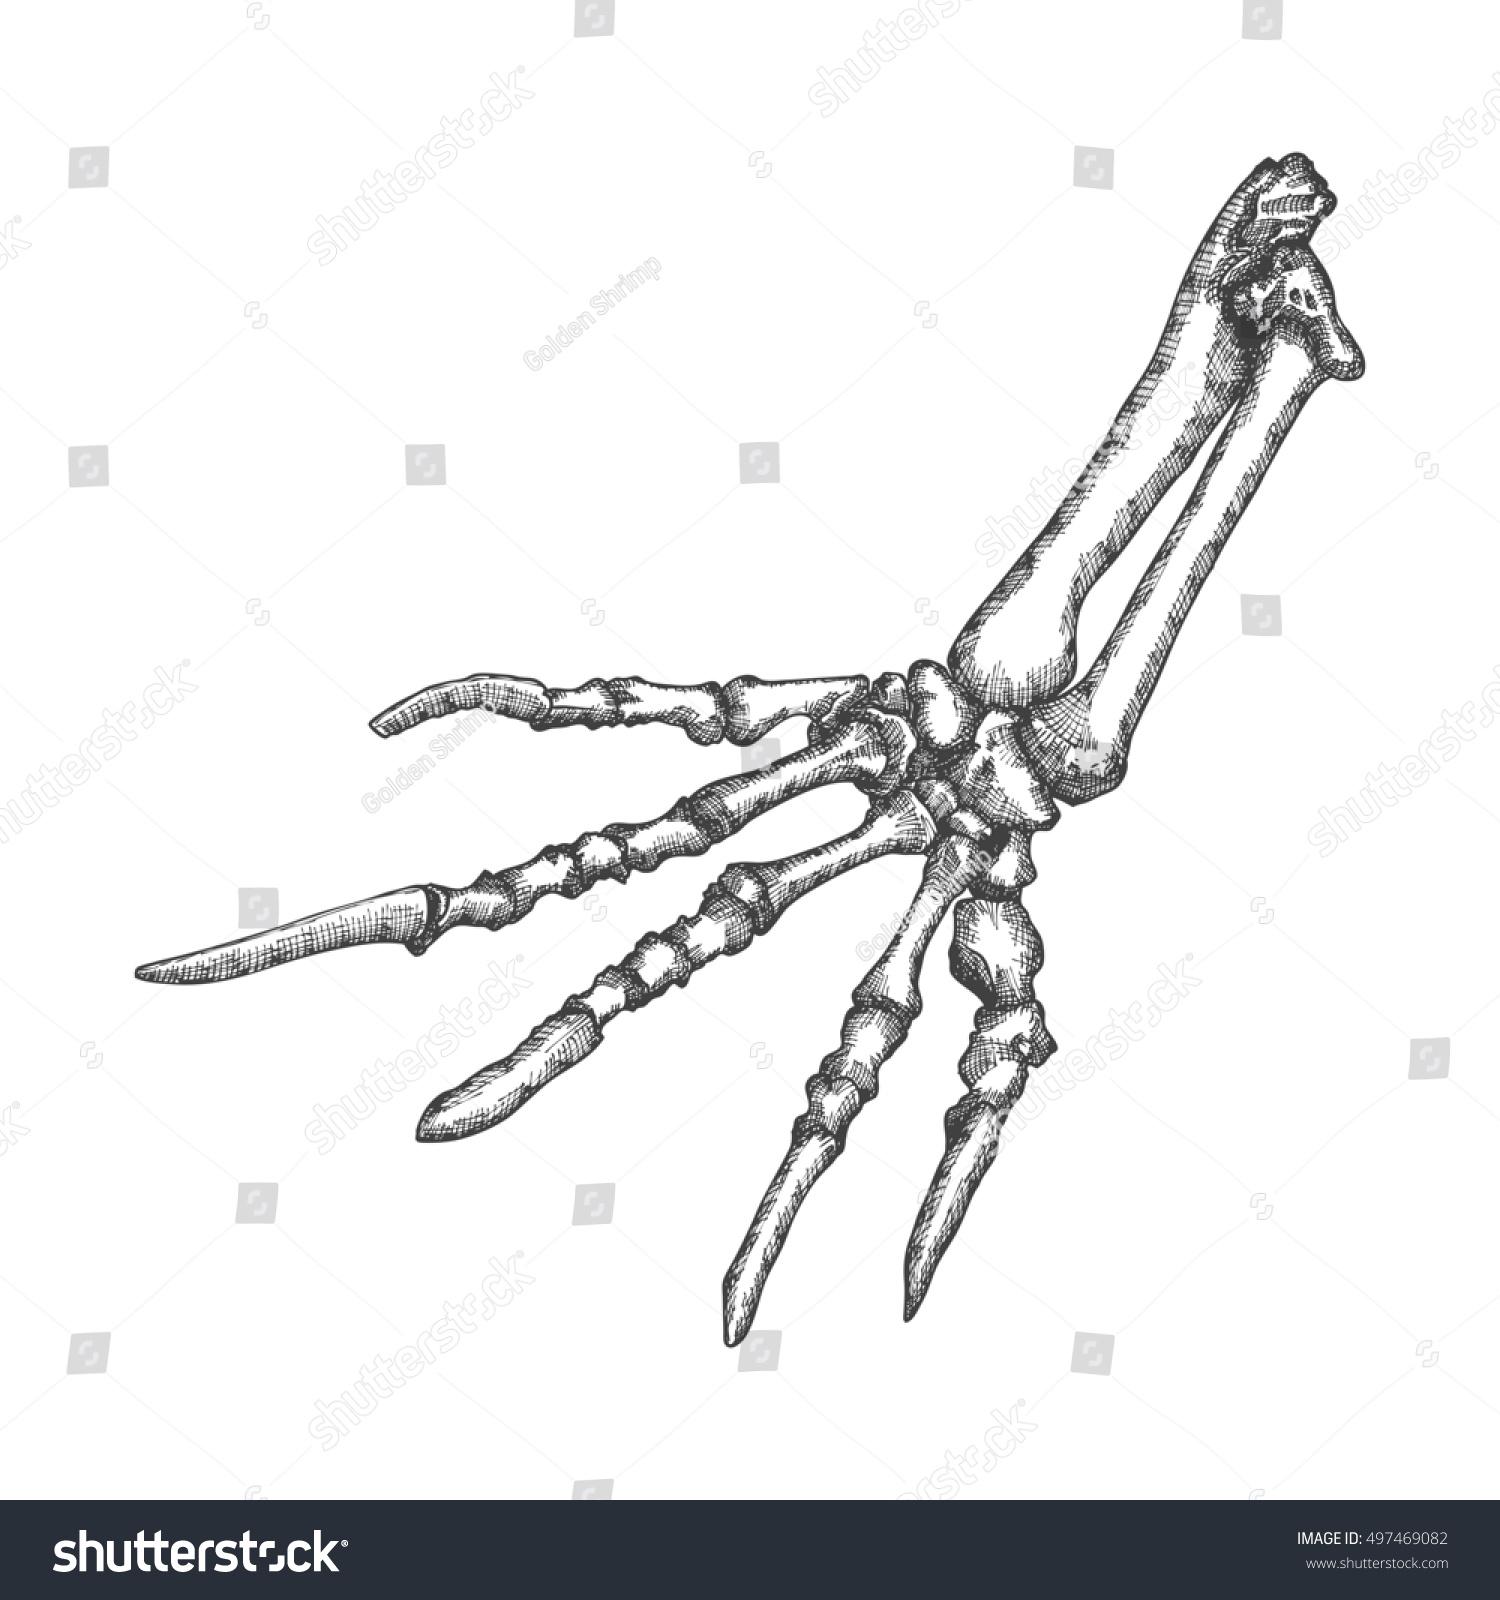 Stylized Drawing Lizard Bones Hand Decorative Stockillustration